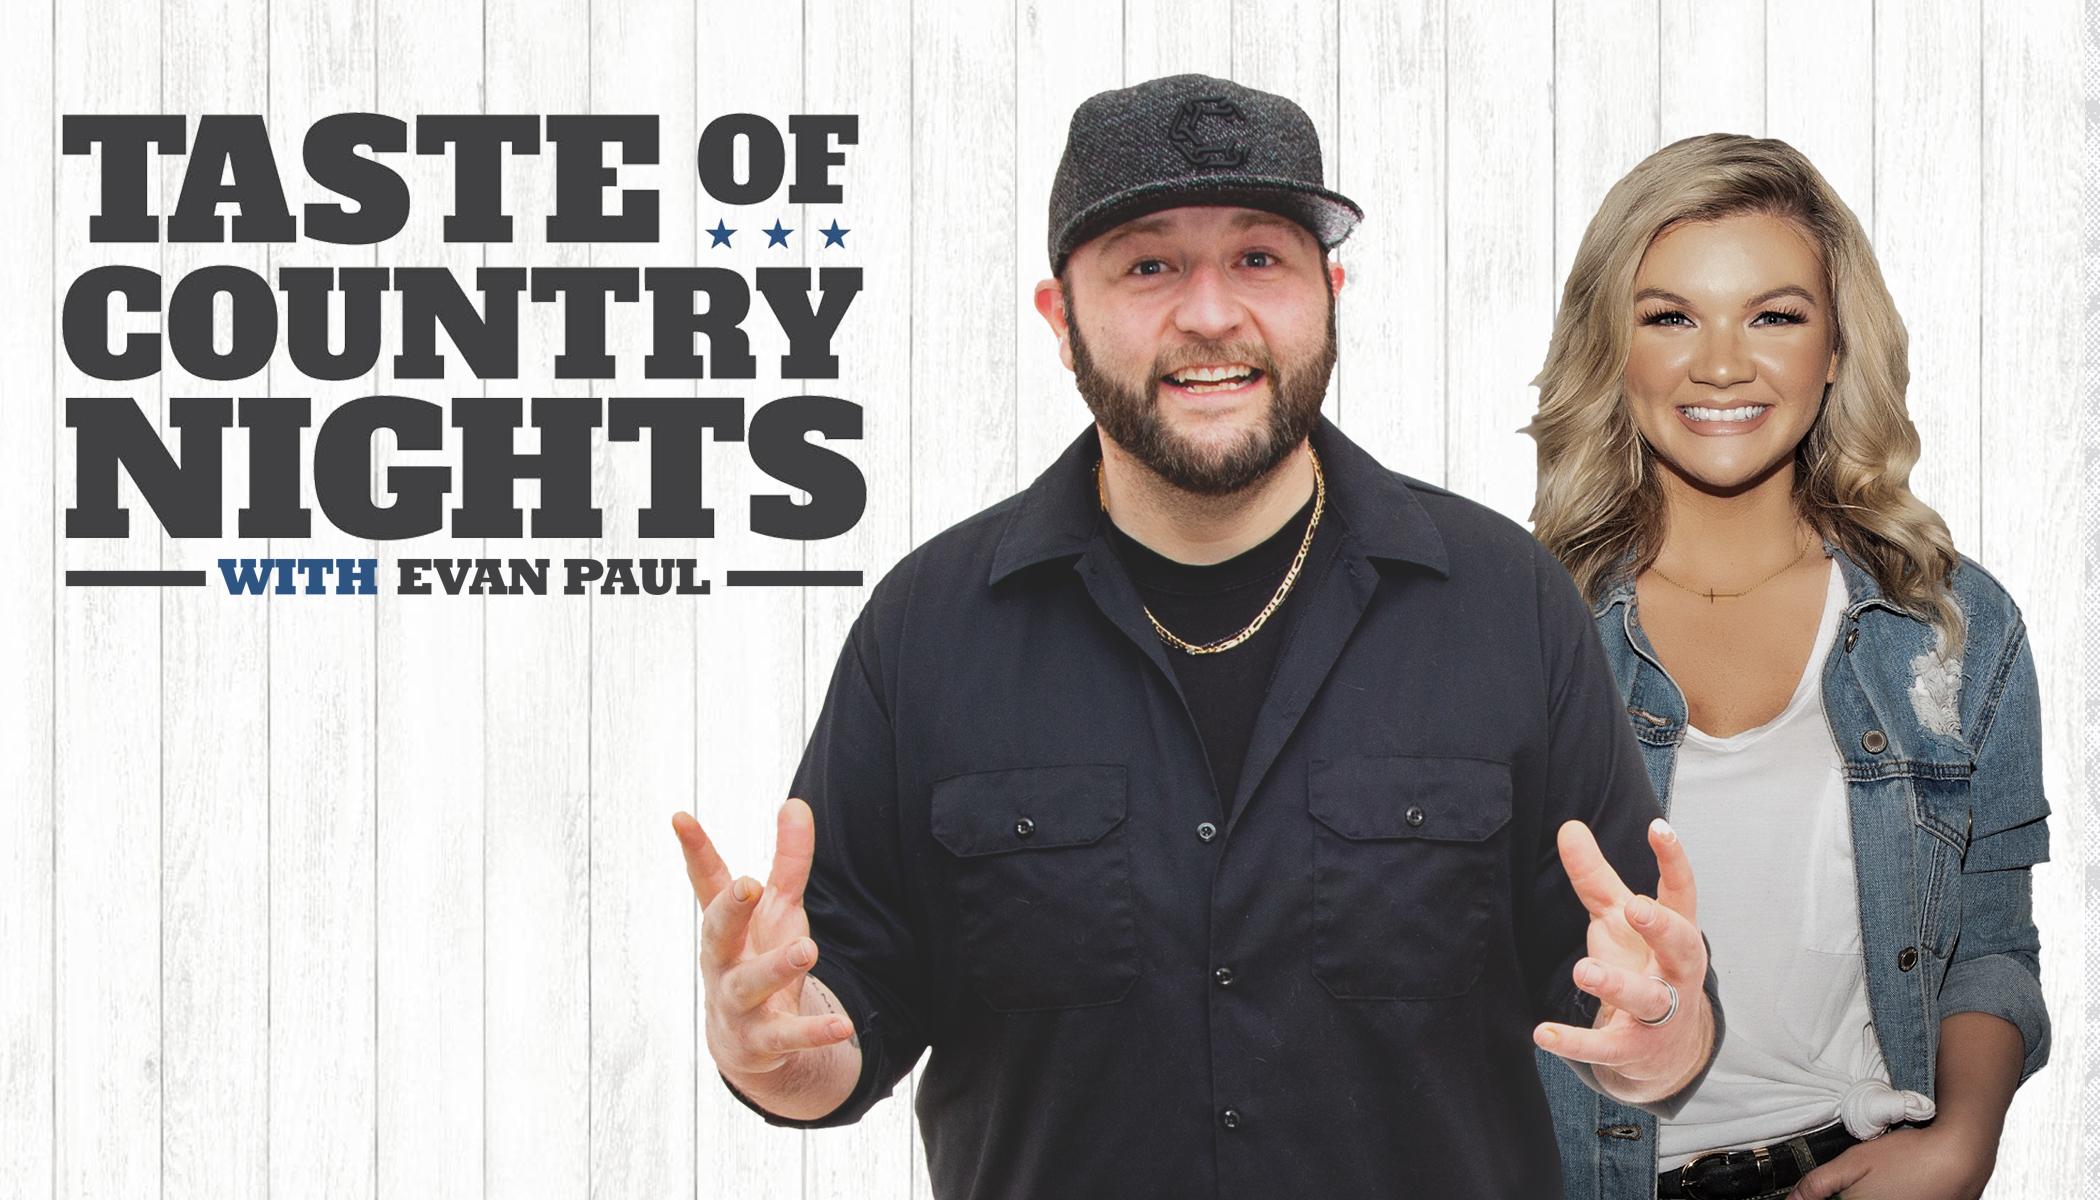 Taste of Country Nights